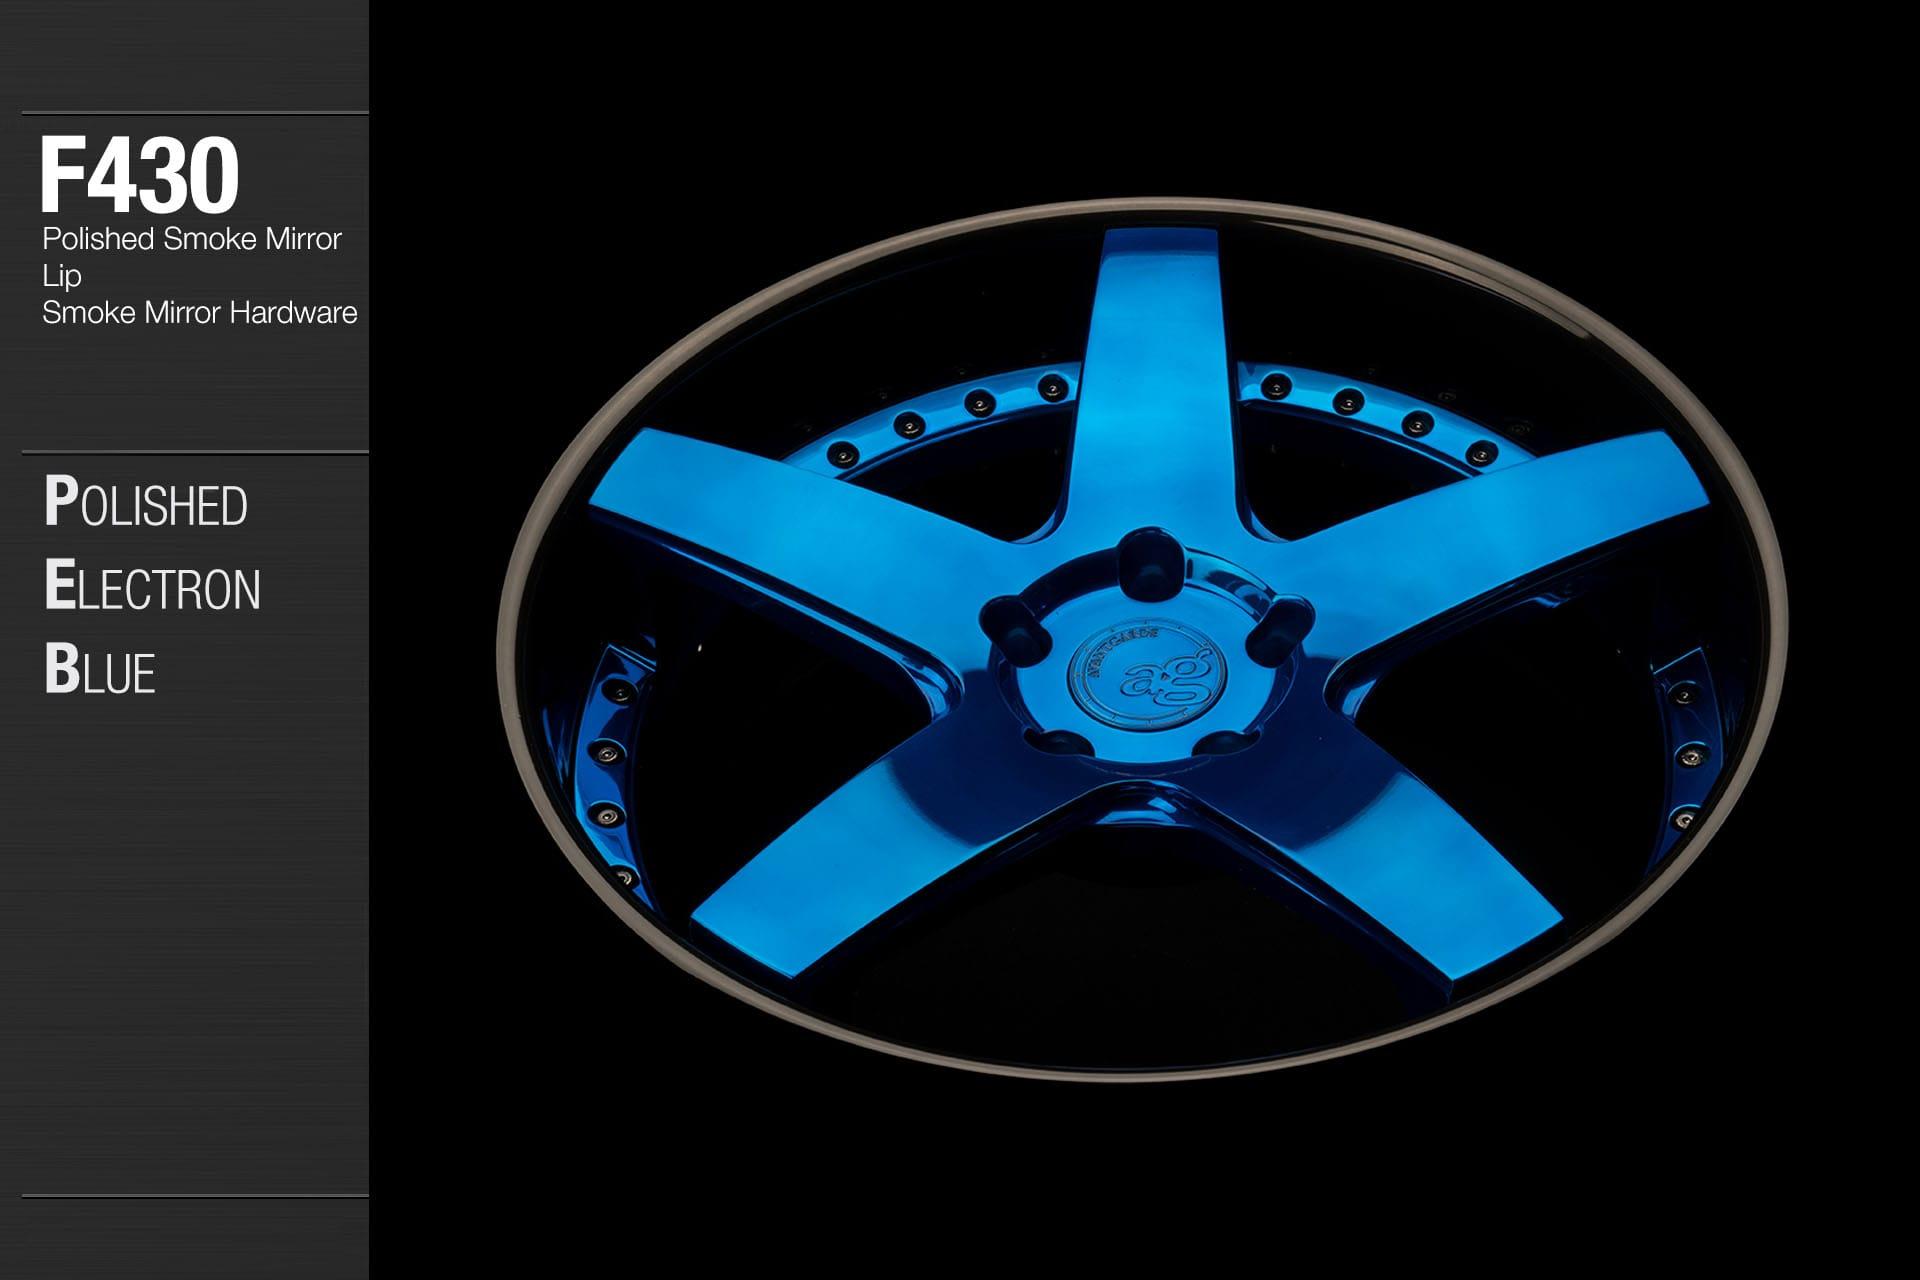 avant garde f430 polished electron blue center polished smoke mirror lip smoke mirror hardware